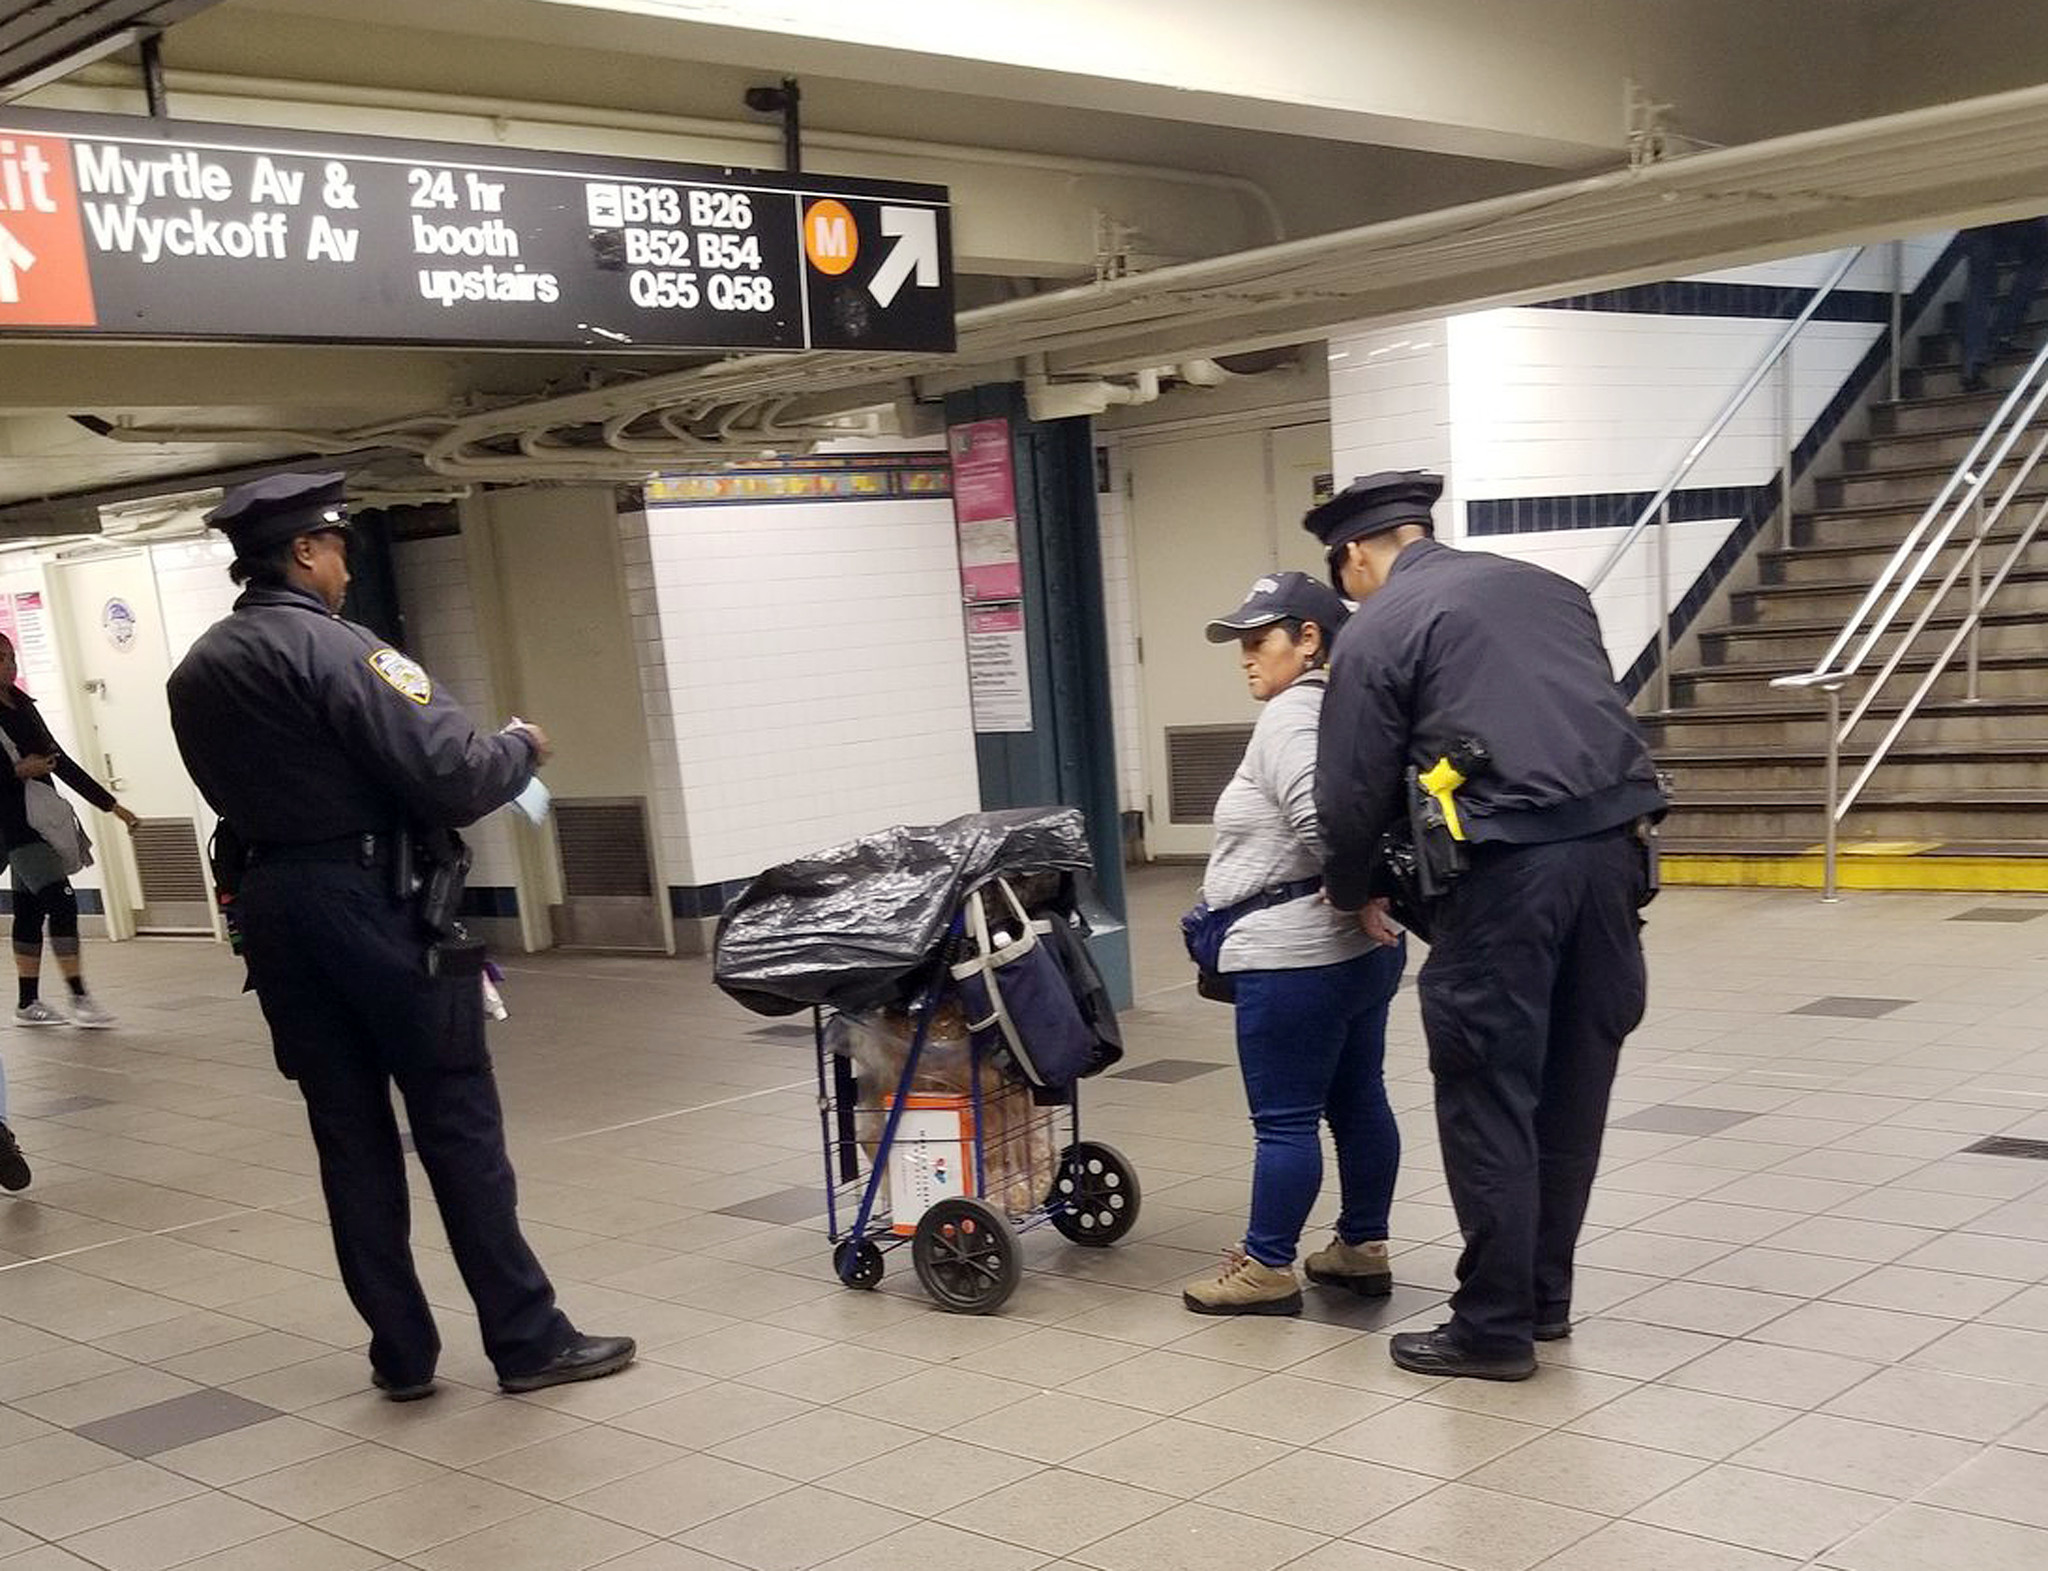 Why the churro arrest matters: An unfair street vendor cap helps criminalize poverty